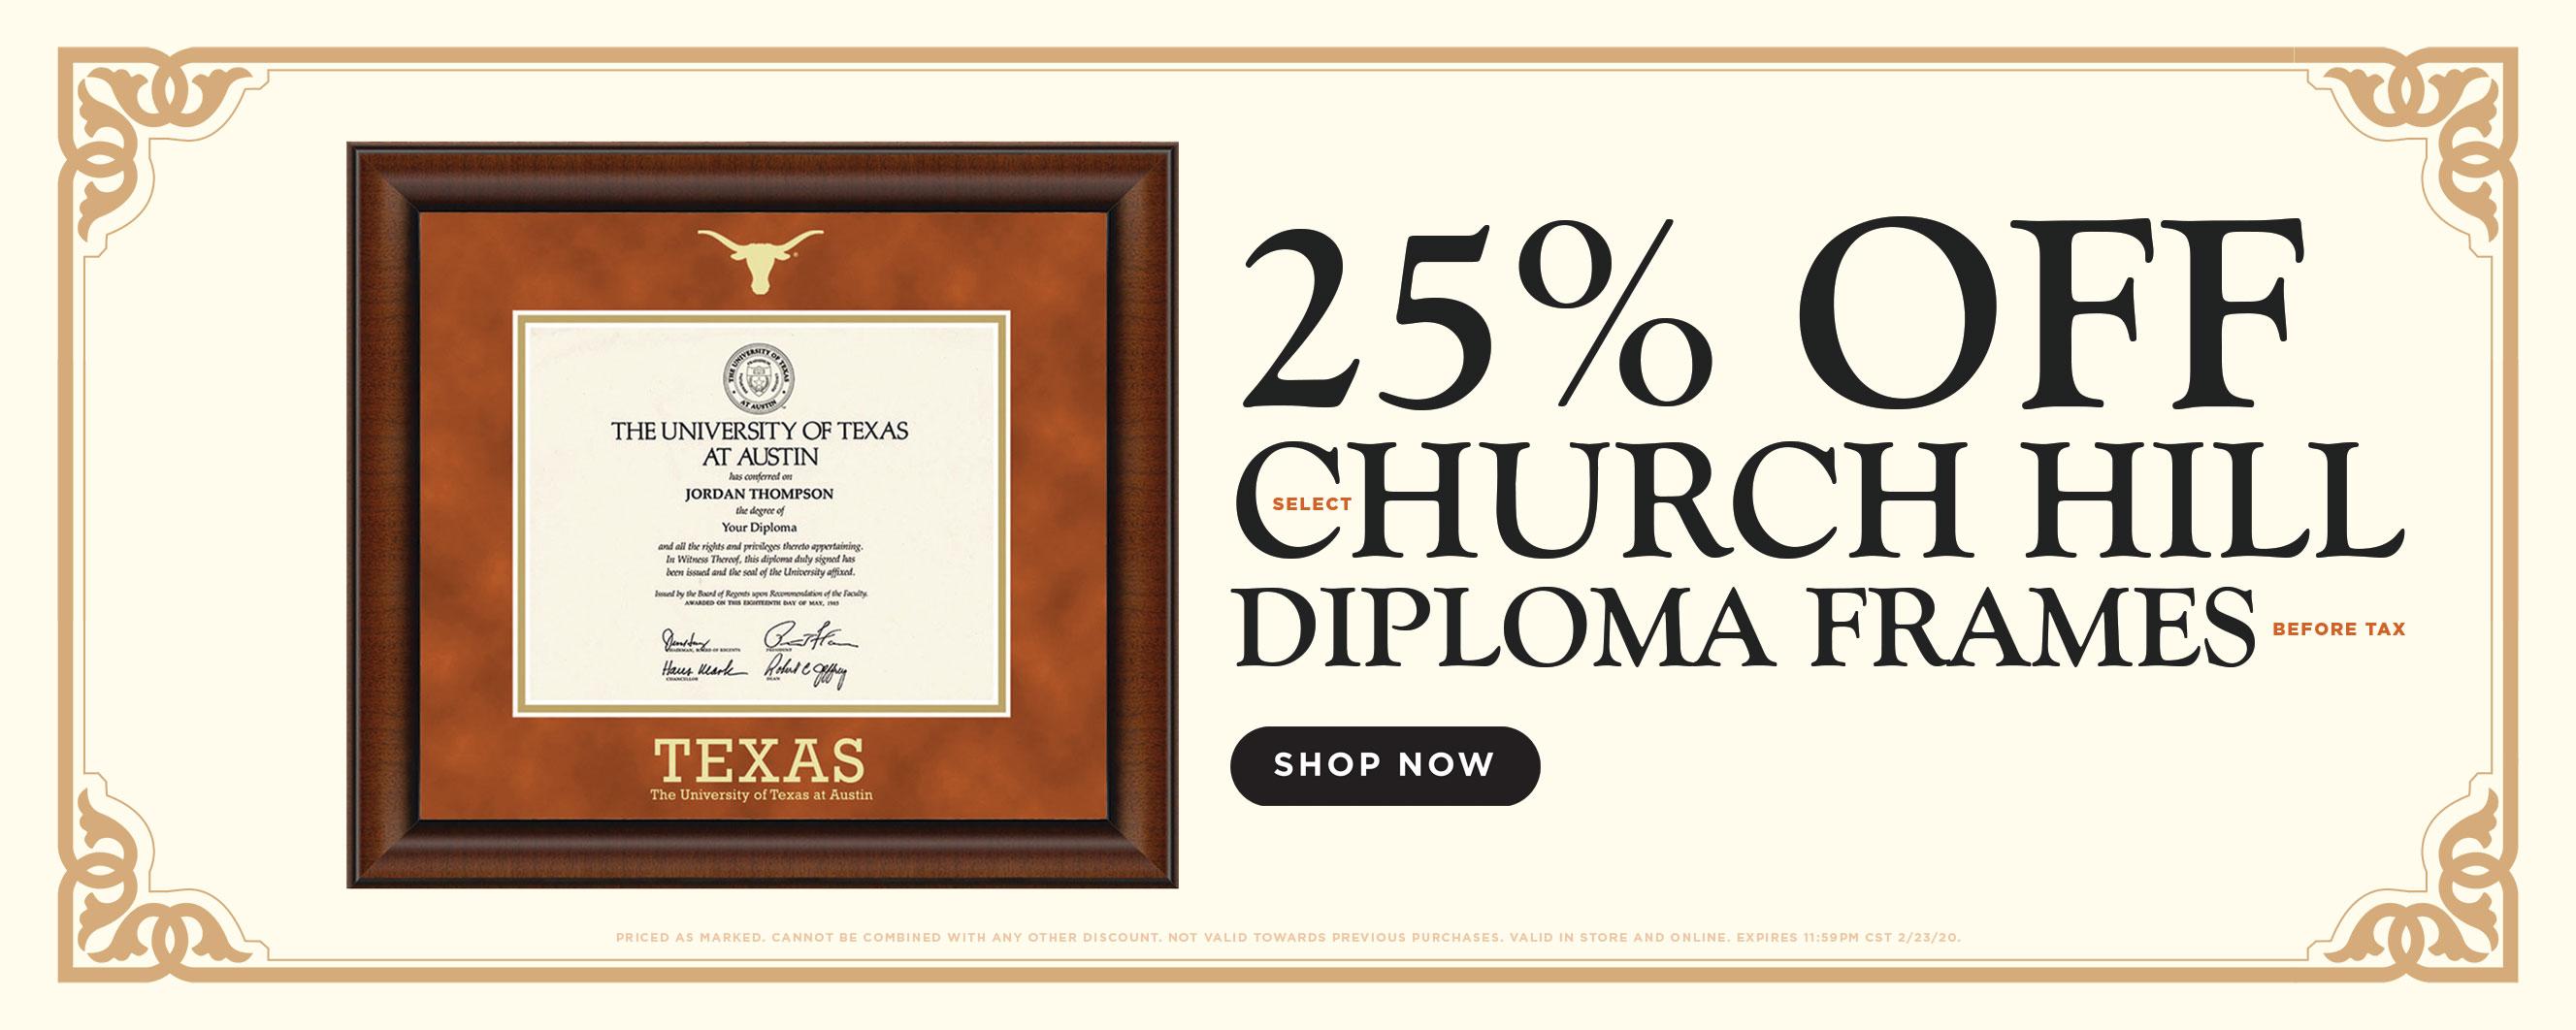 25% OFF CHURCHILL DIPLOMA FRAMES